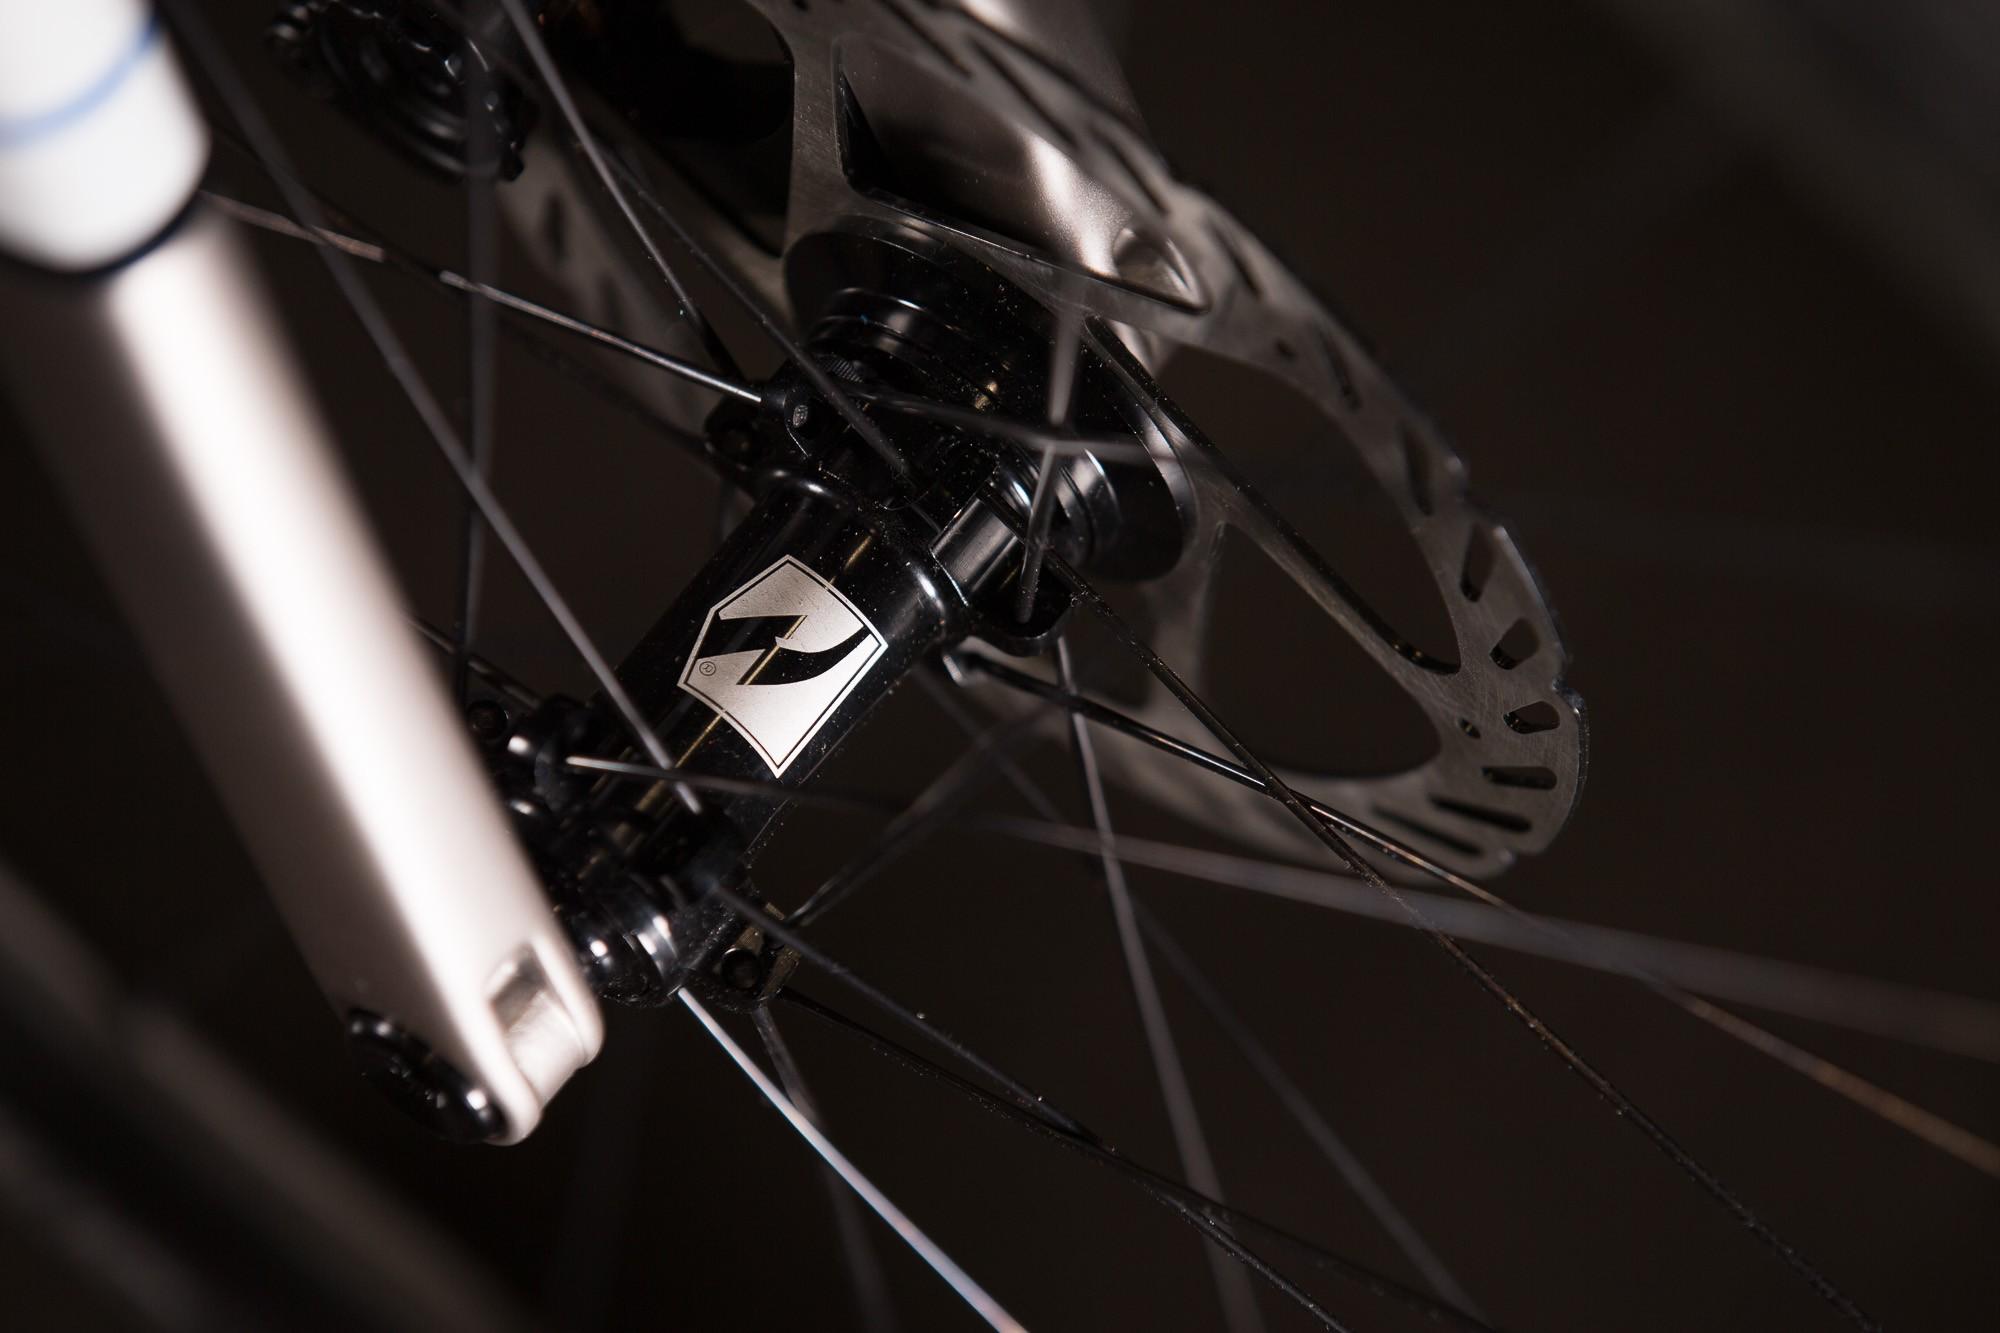 2016-NAHBS-Strong-Disc-Road-Bike-with-SRAM-RED-eTap-13-1335x890@2x.jpg